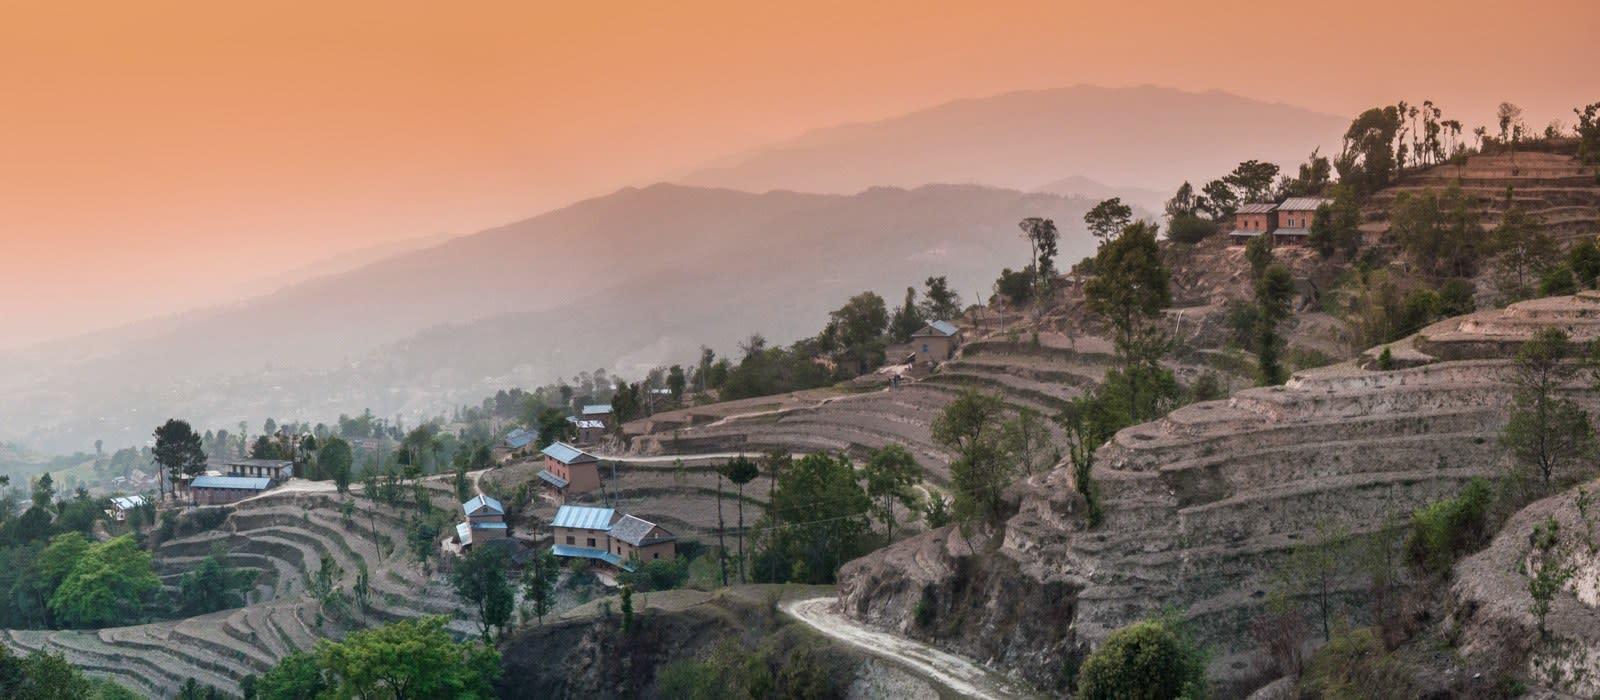 Reiseziel Nagarkot Nepal